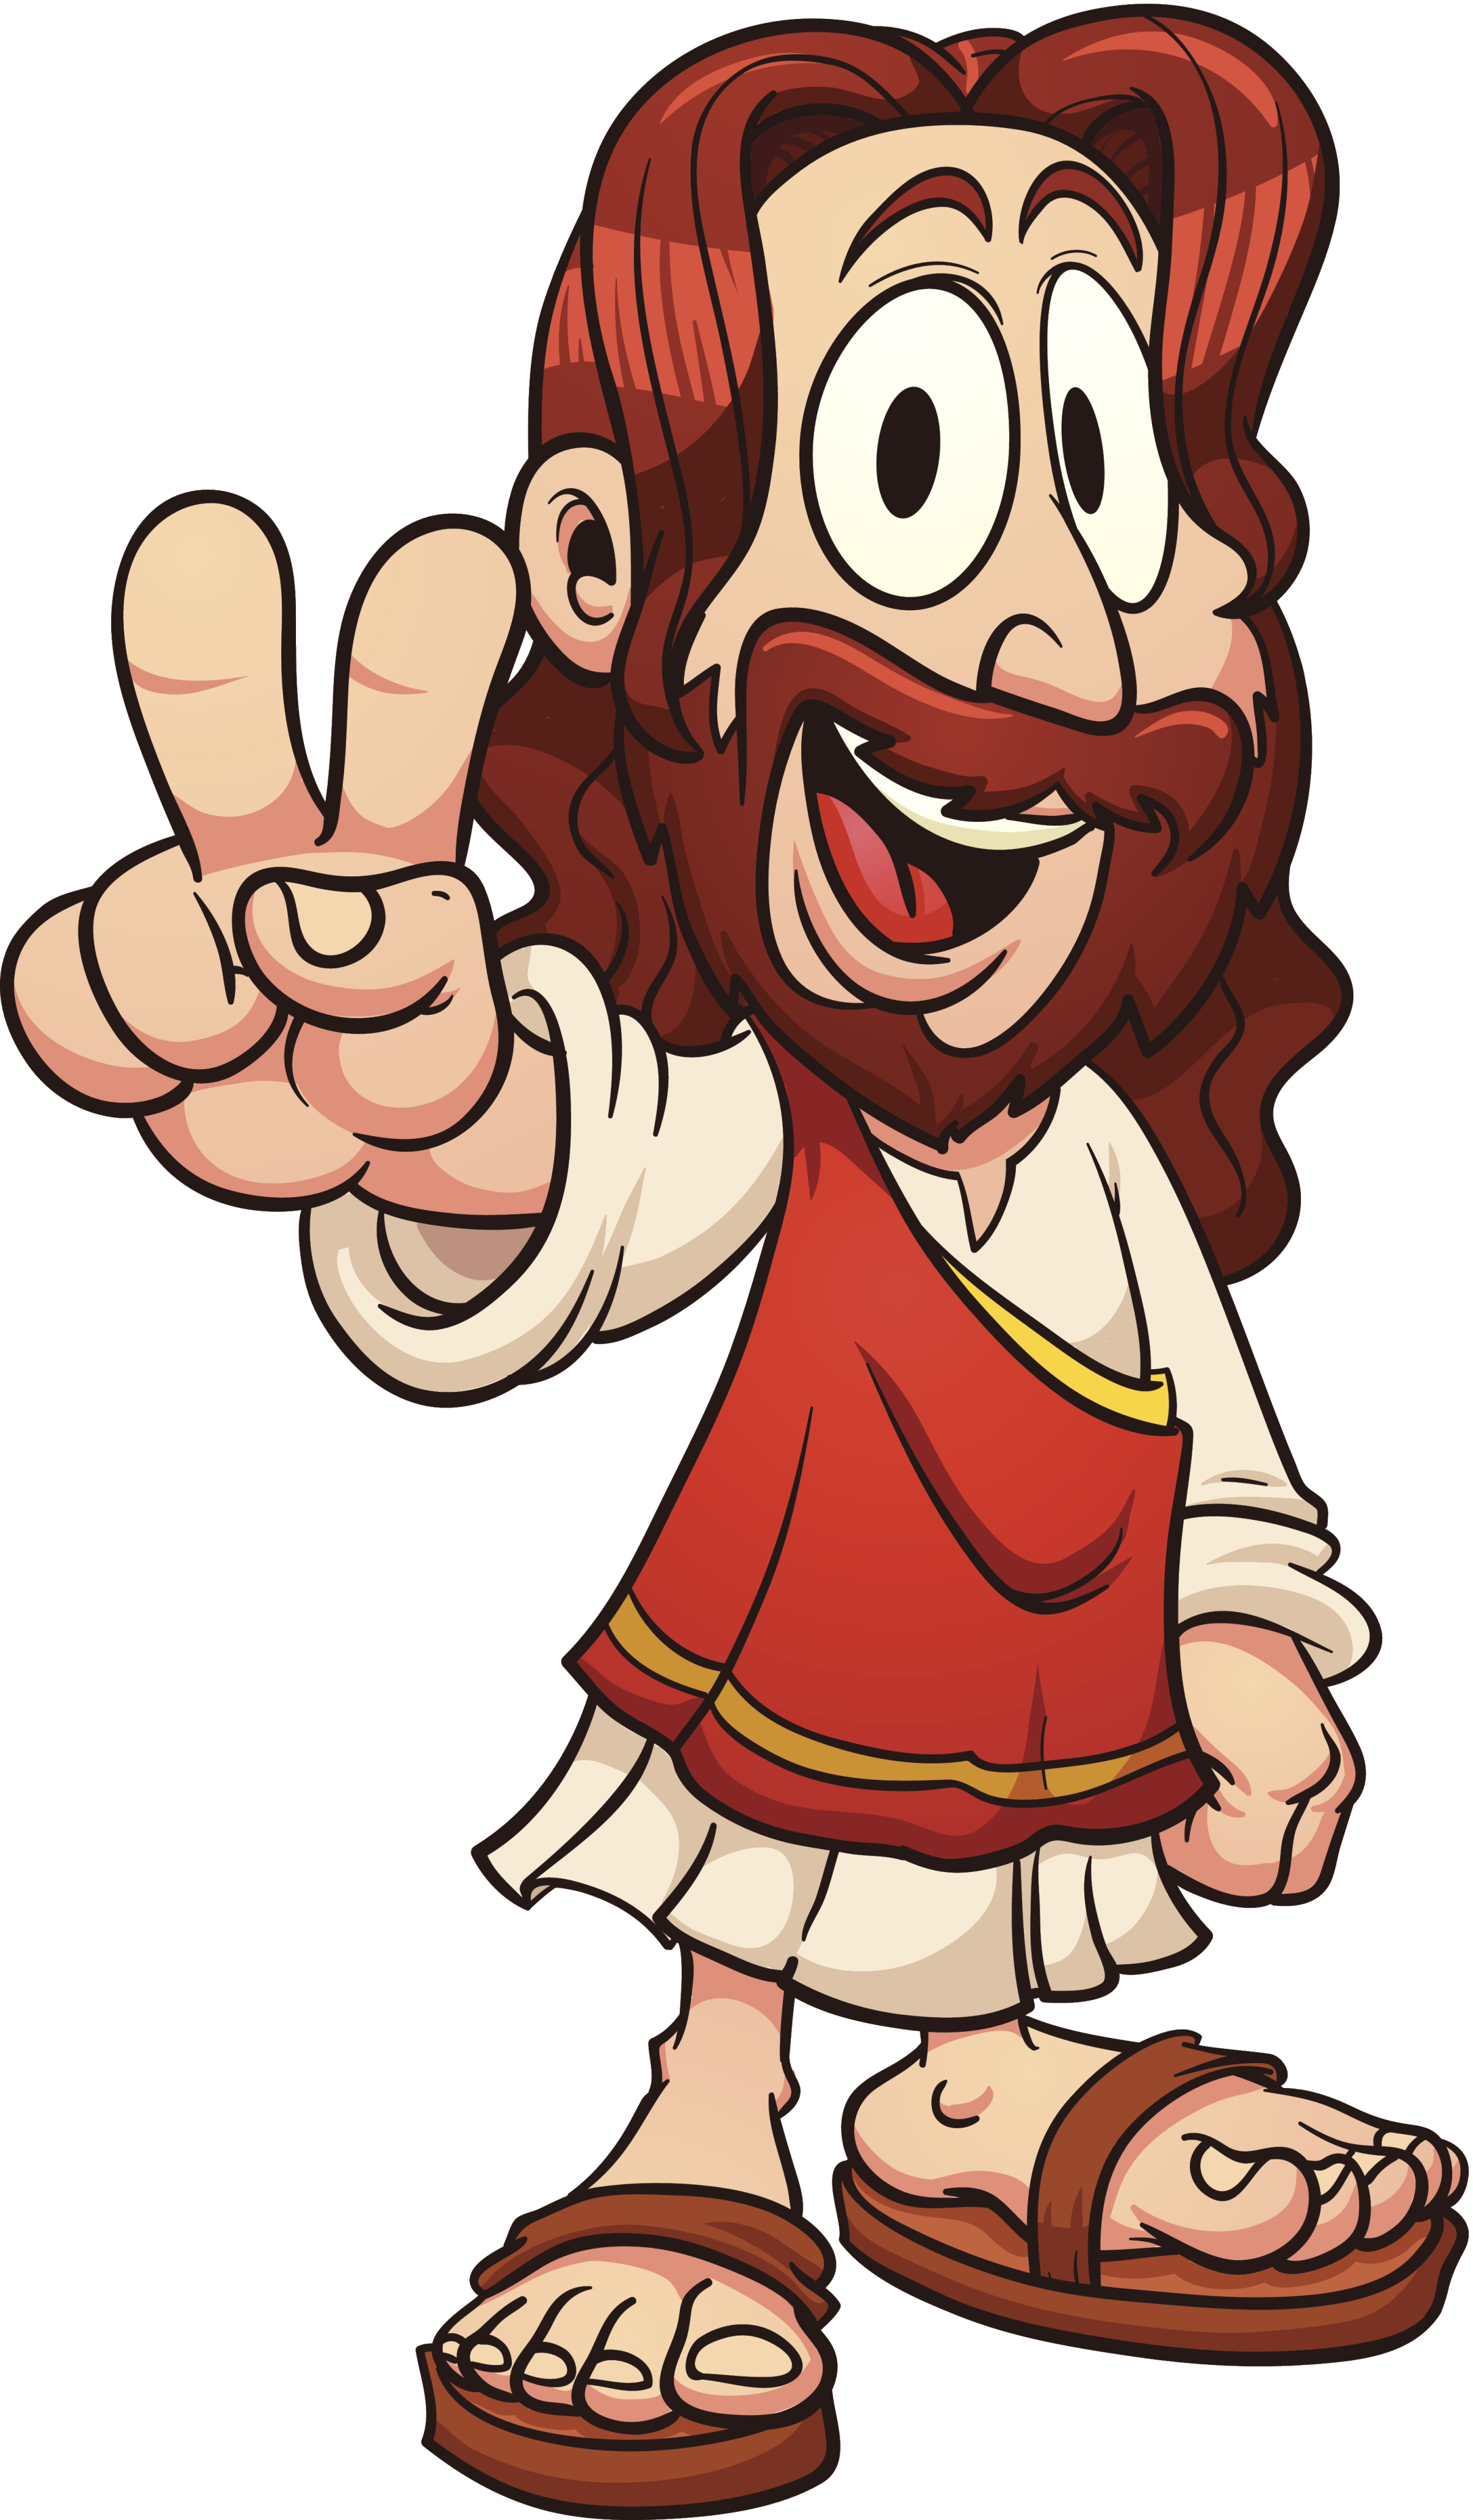 Jesus clipart cartoon. Free download clip art